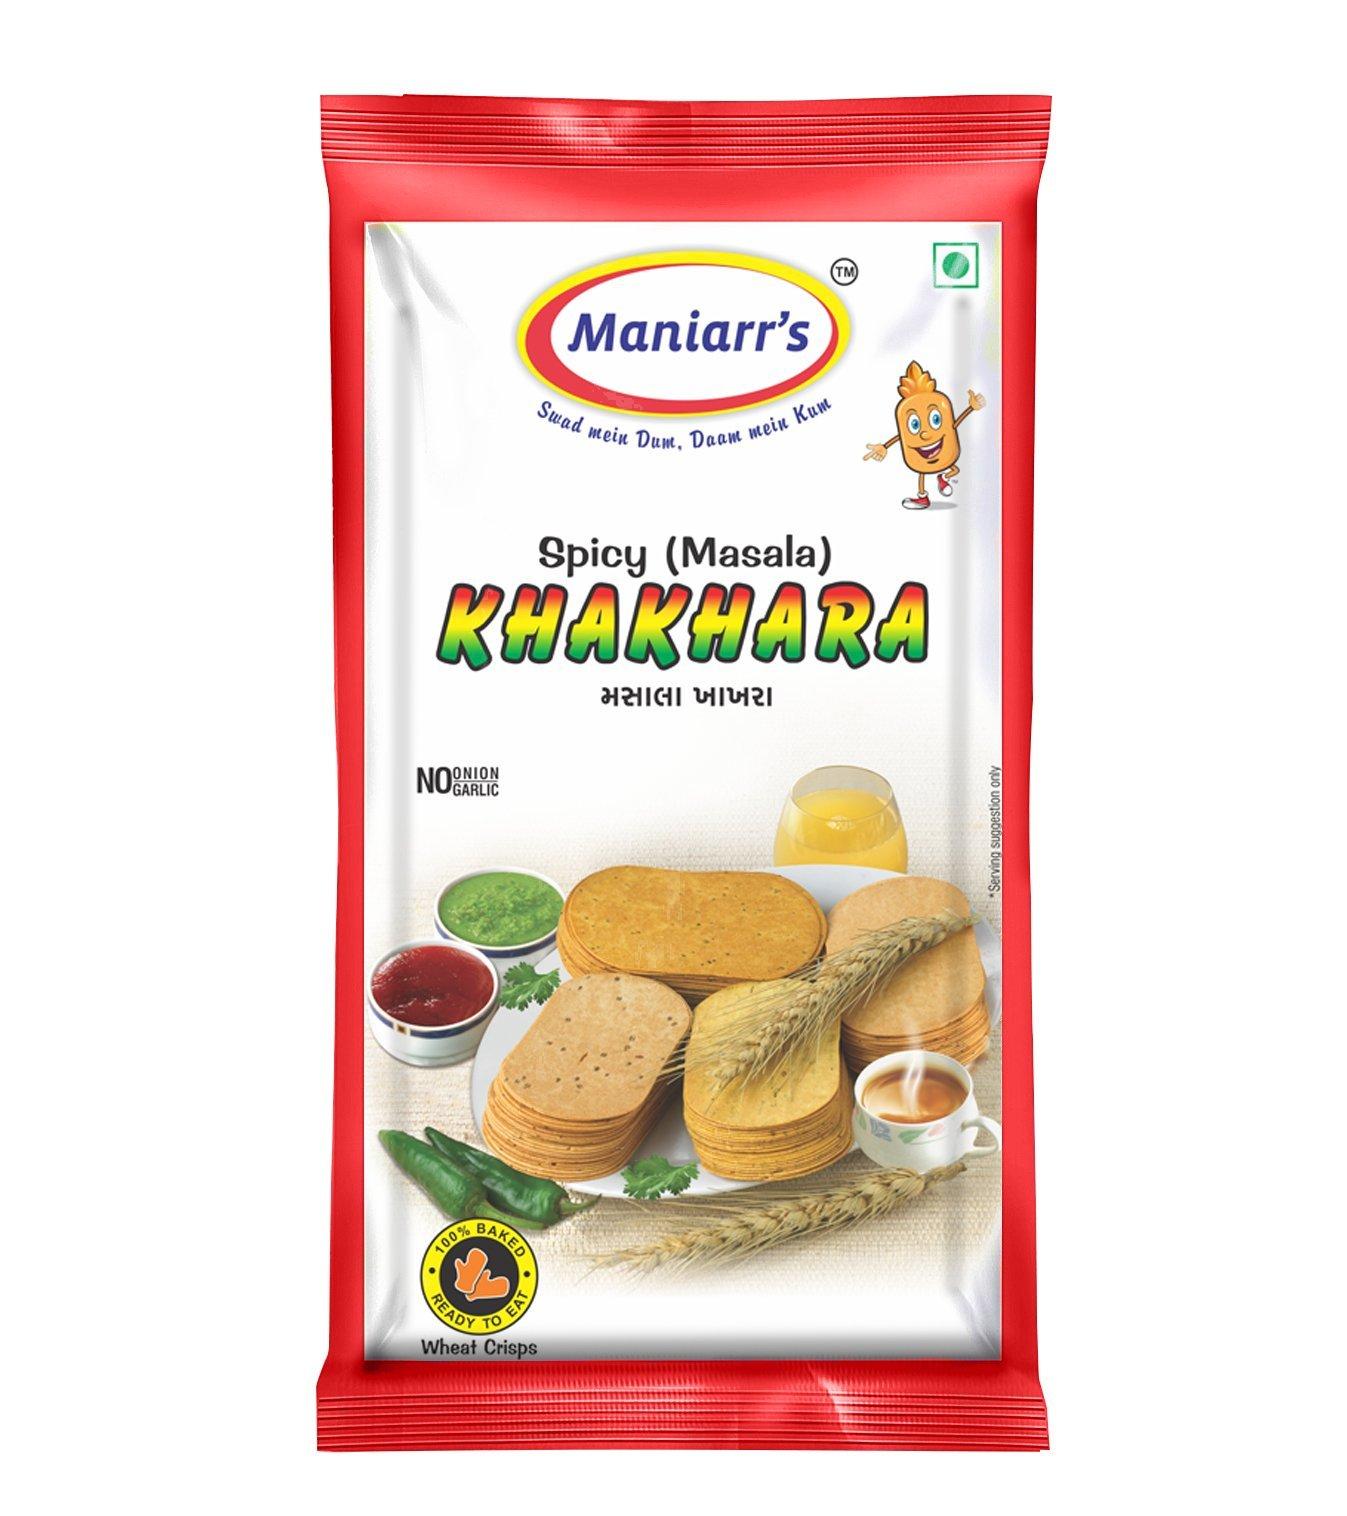 MASALA Khakhra (pack of 8) - Unnati Enterprises